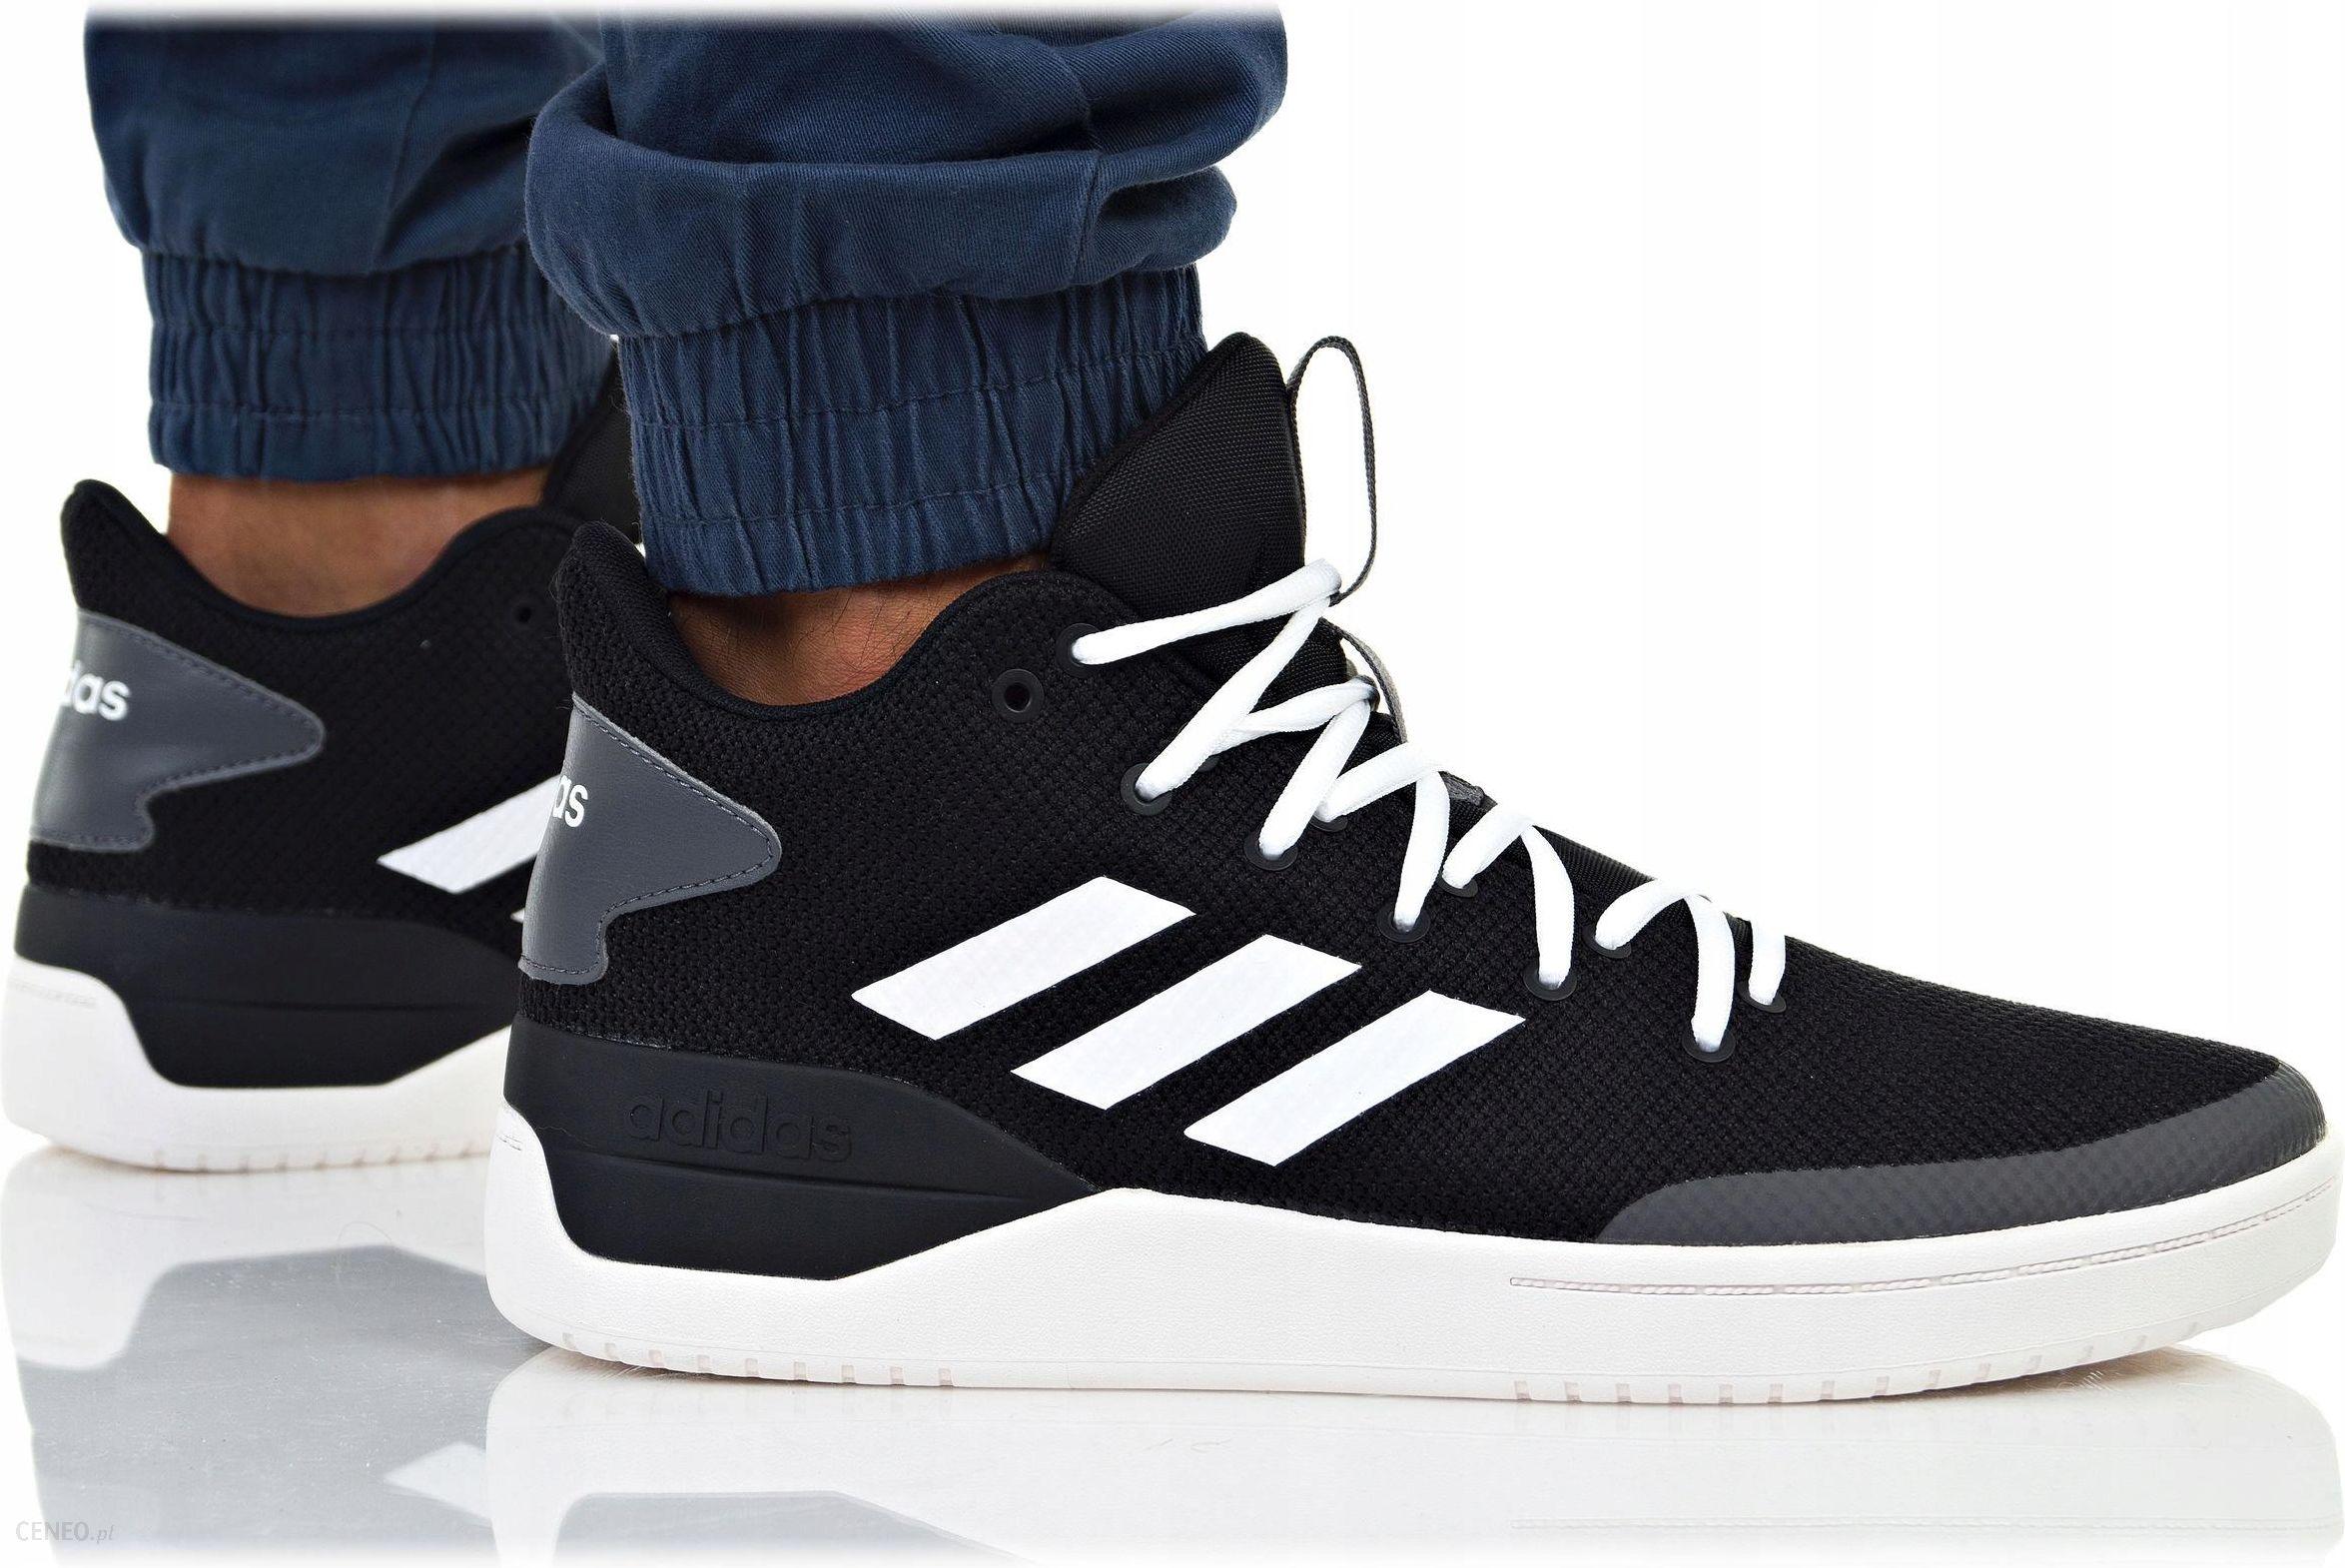 Buty damskie Adidas Galaxy B44164 Do Biegania Hit!